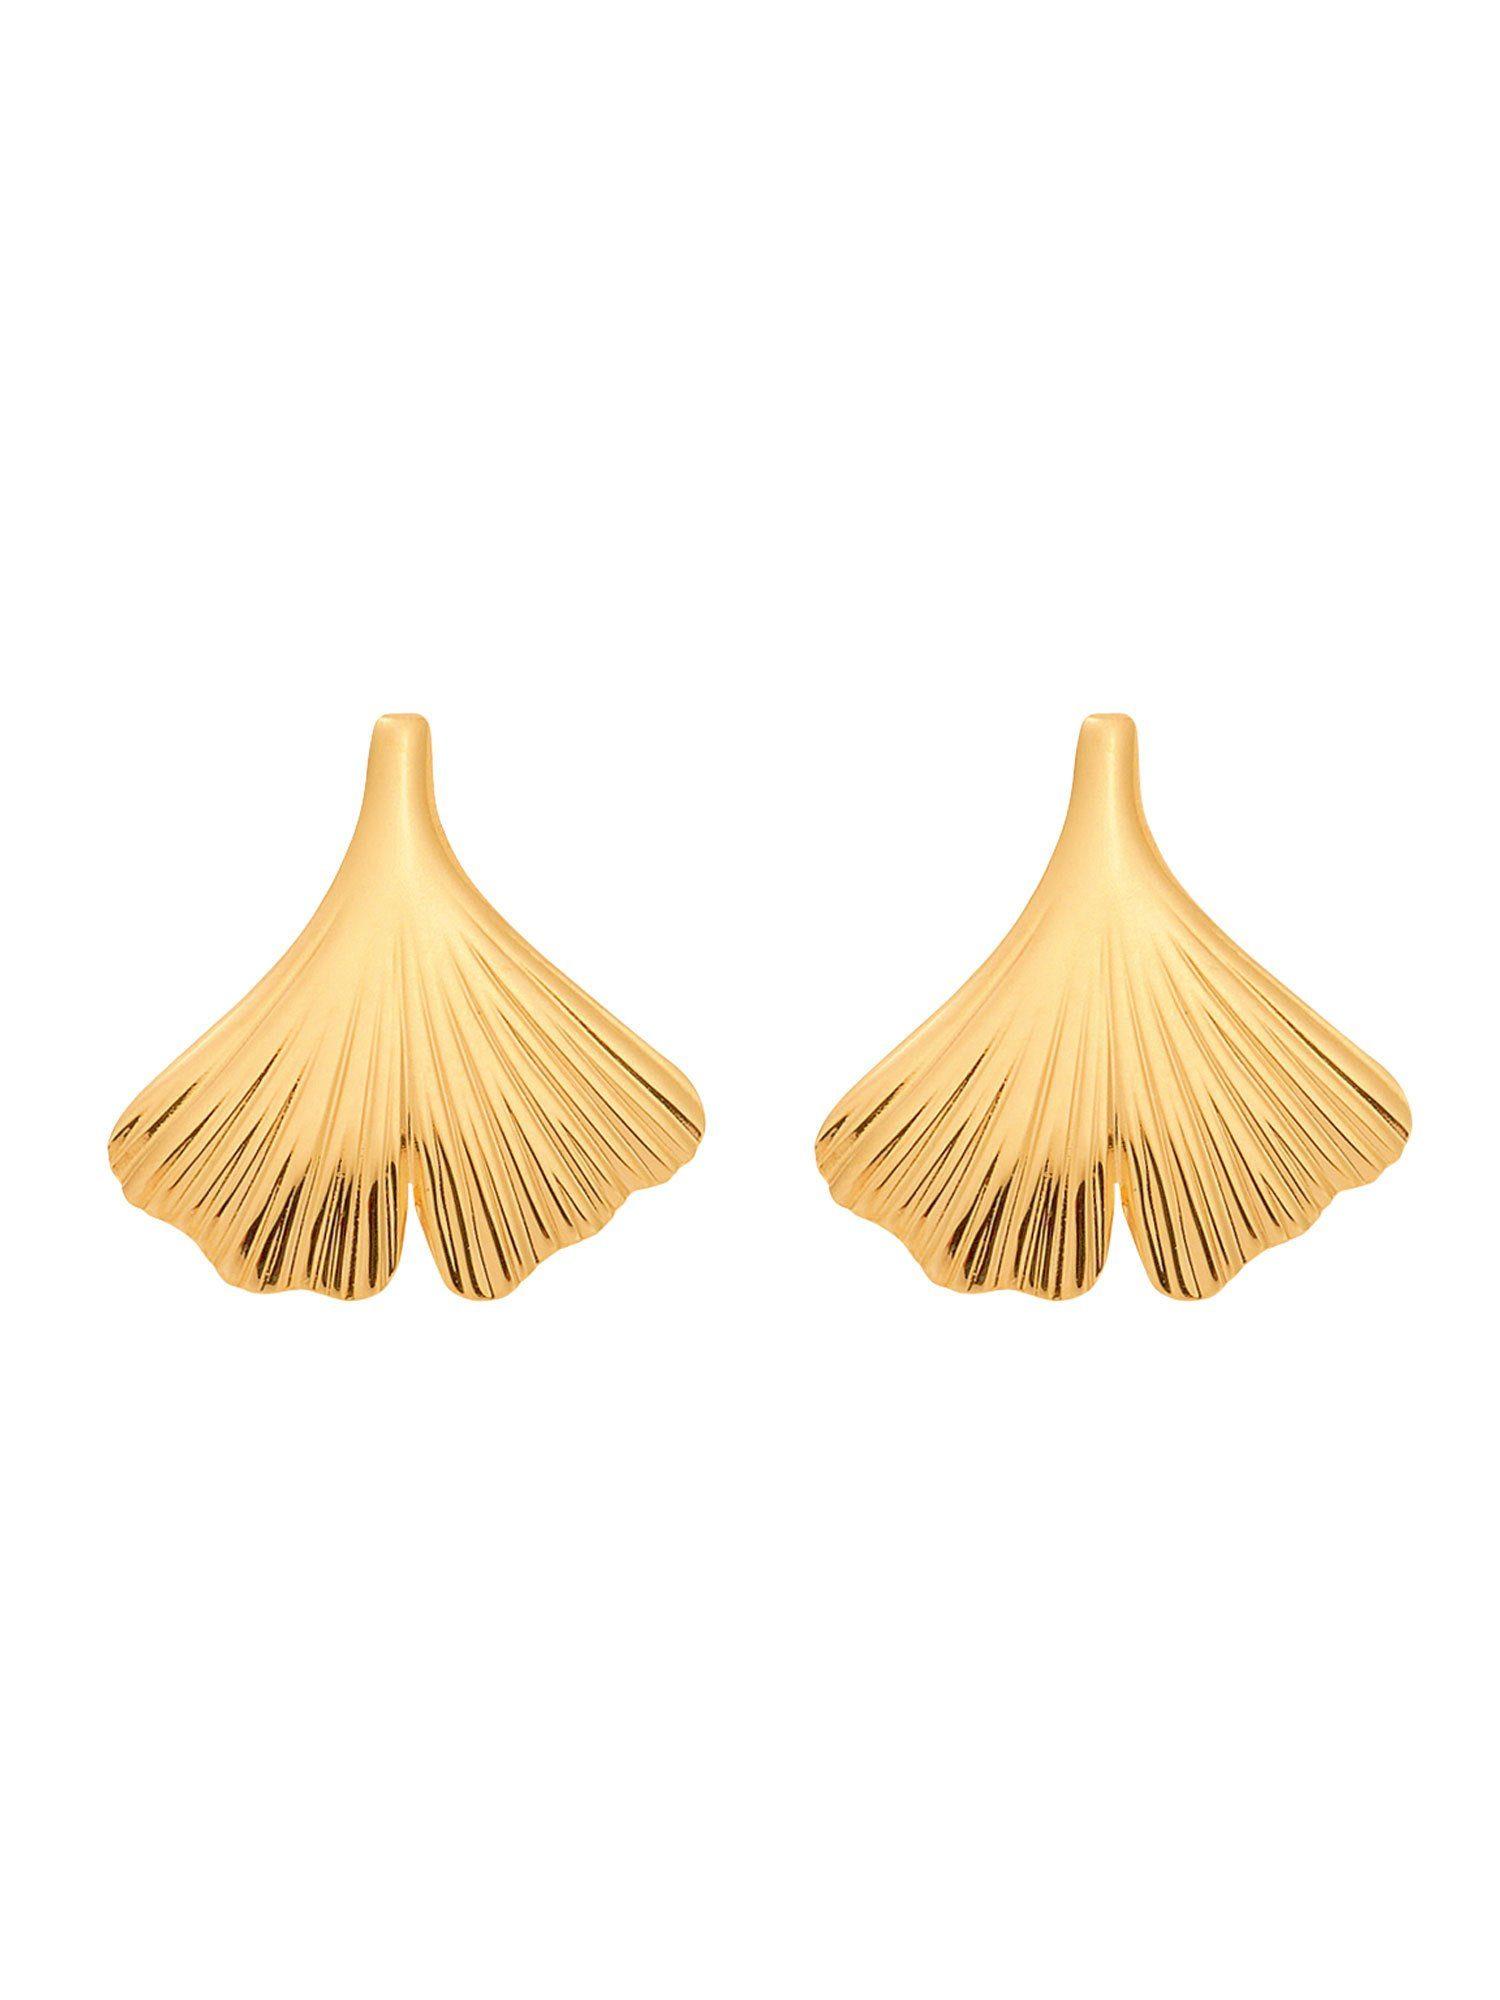 Adelia´s Paar Ohrstecker »Gold Ohrringe« Ginkoblatt 14 k 585 Gelbgold